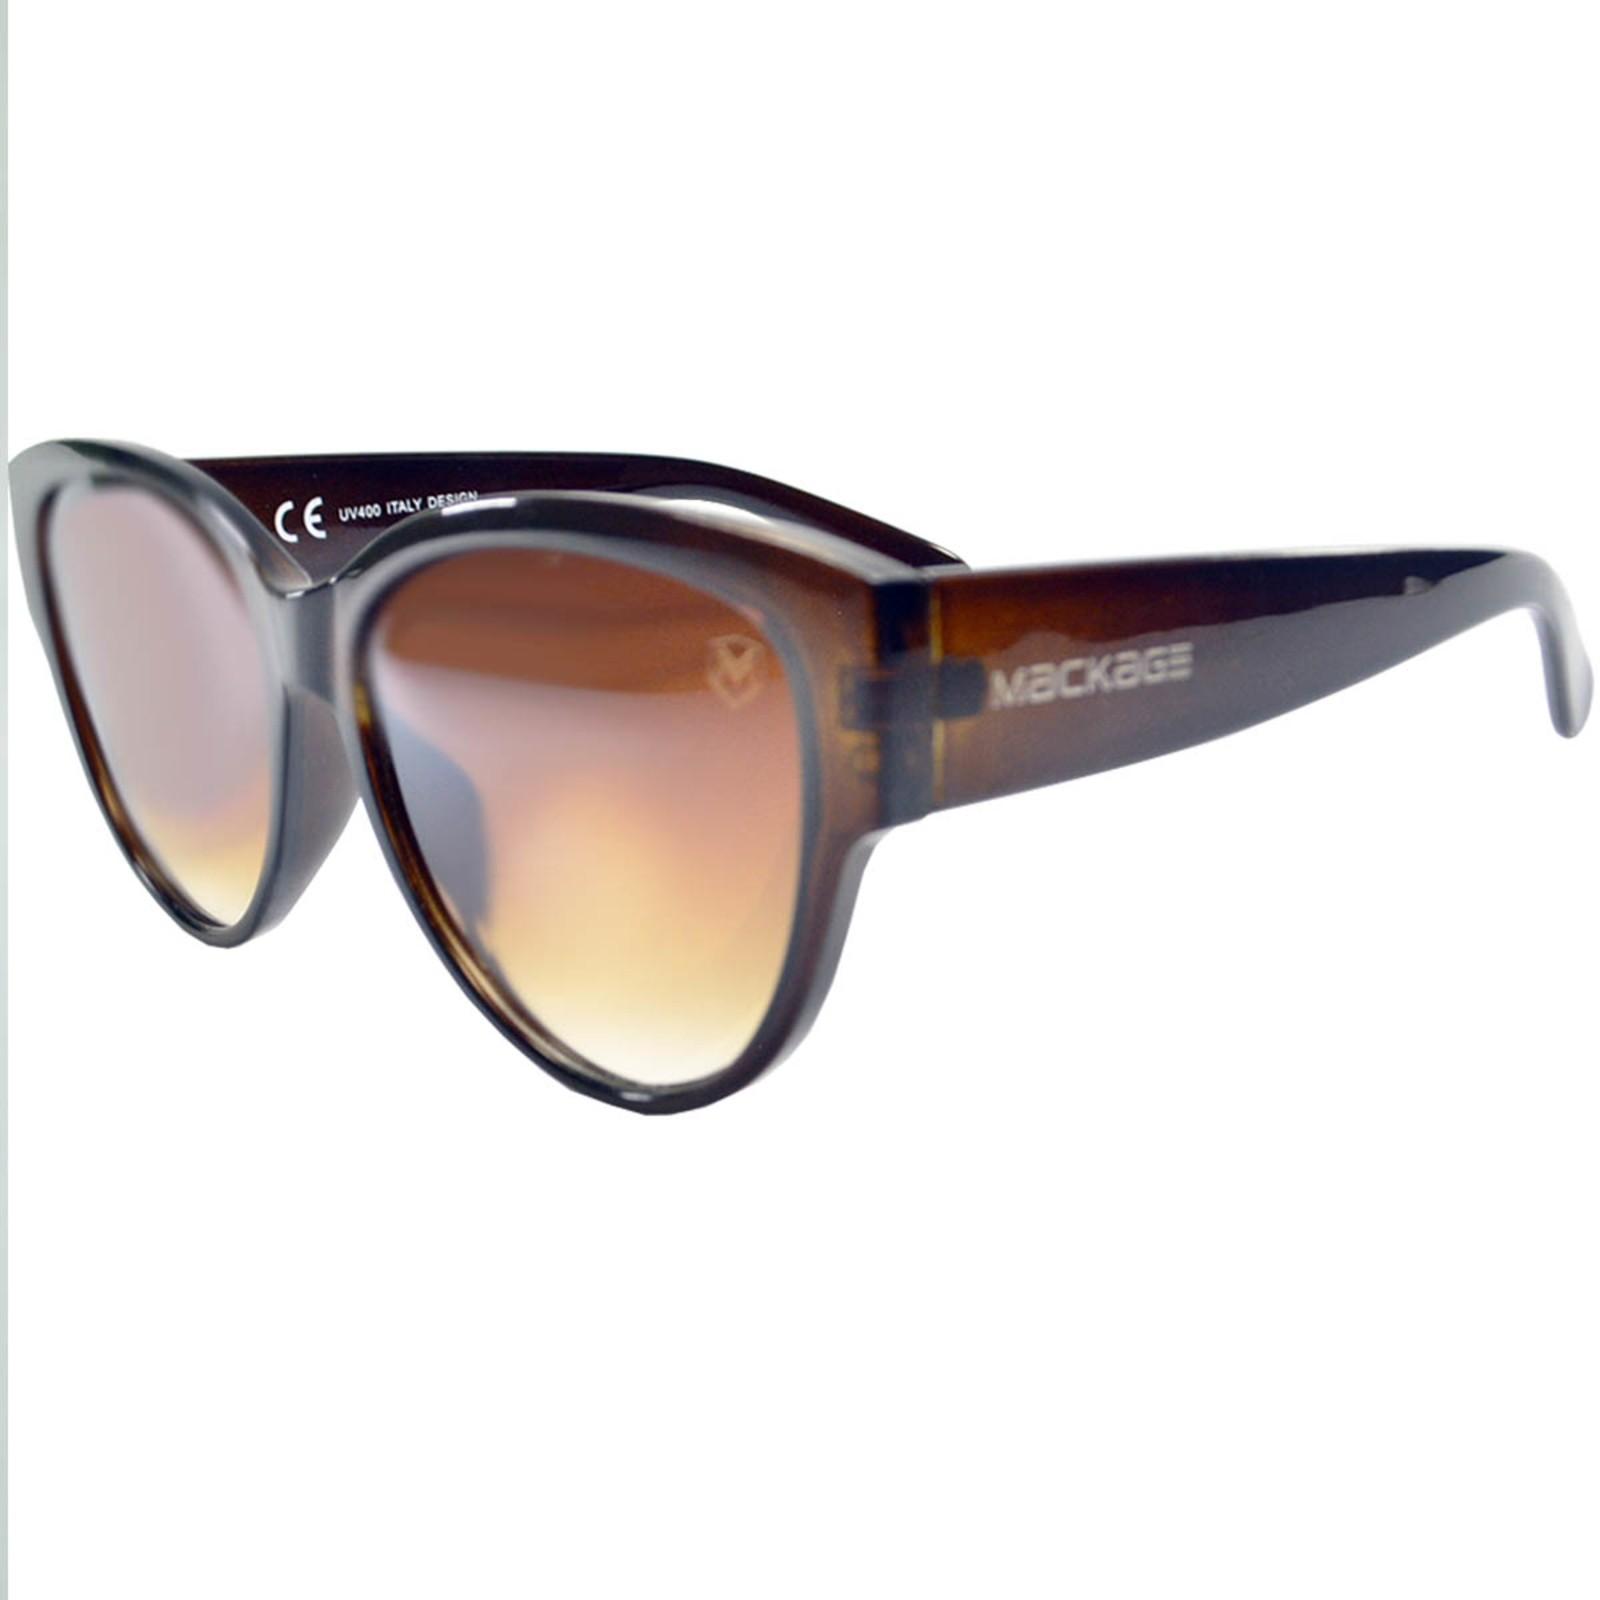 Óculos De Sol Mackage Feminino Acetato Redondo Jacko Feminino